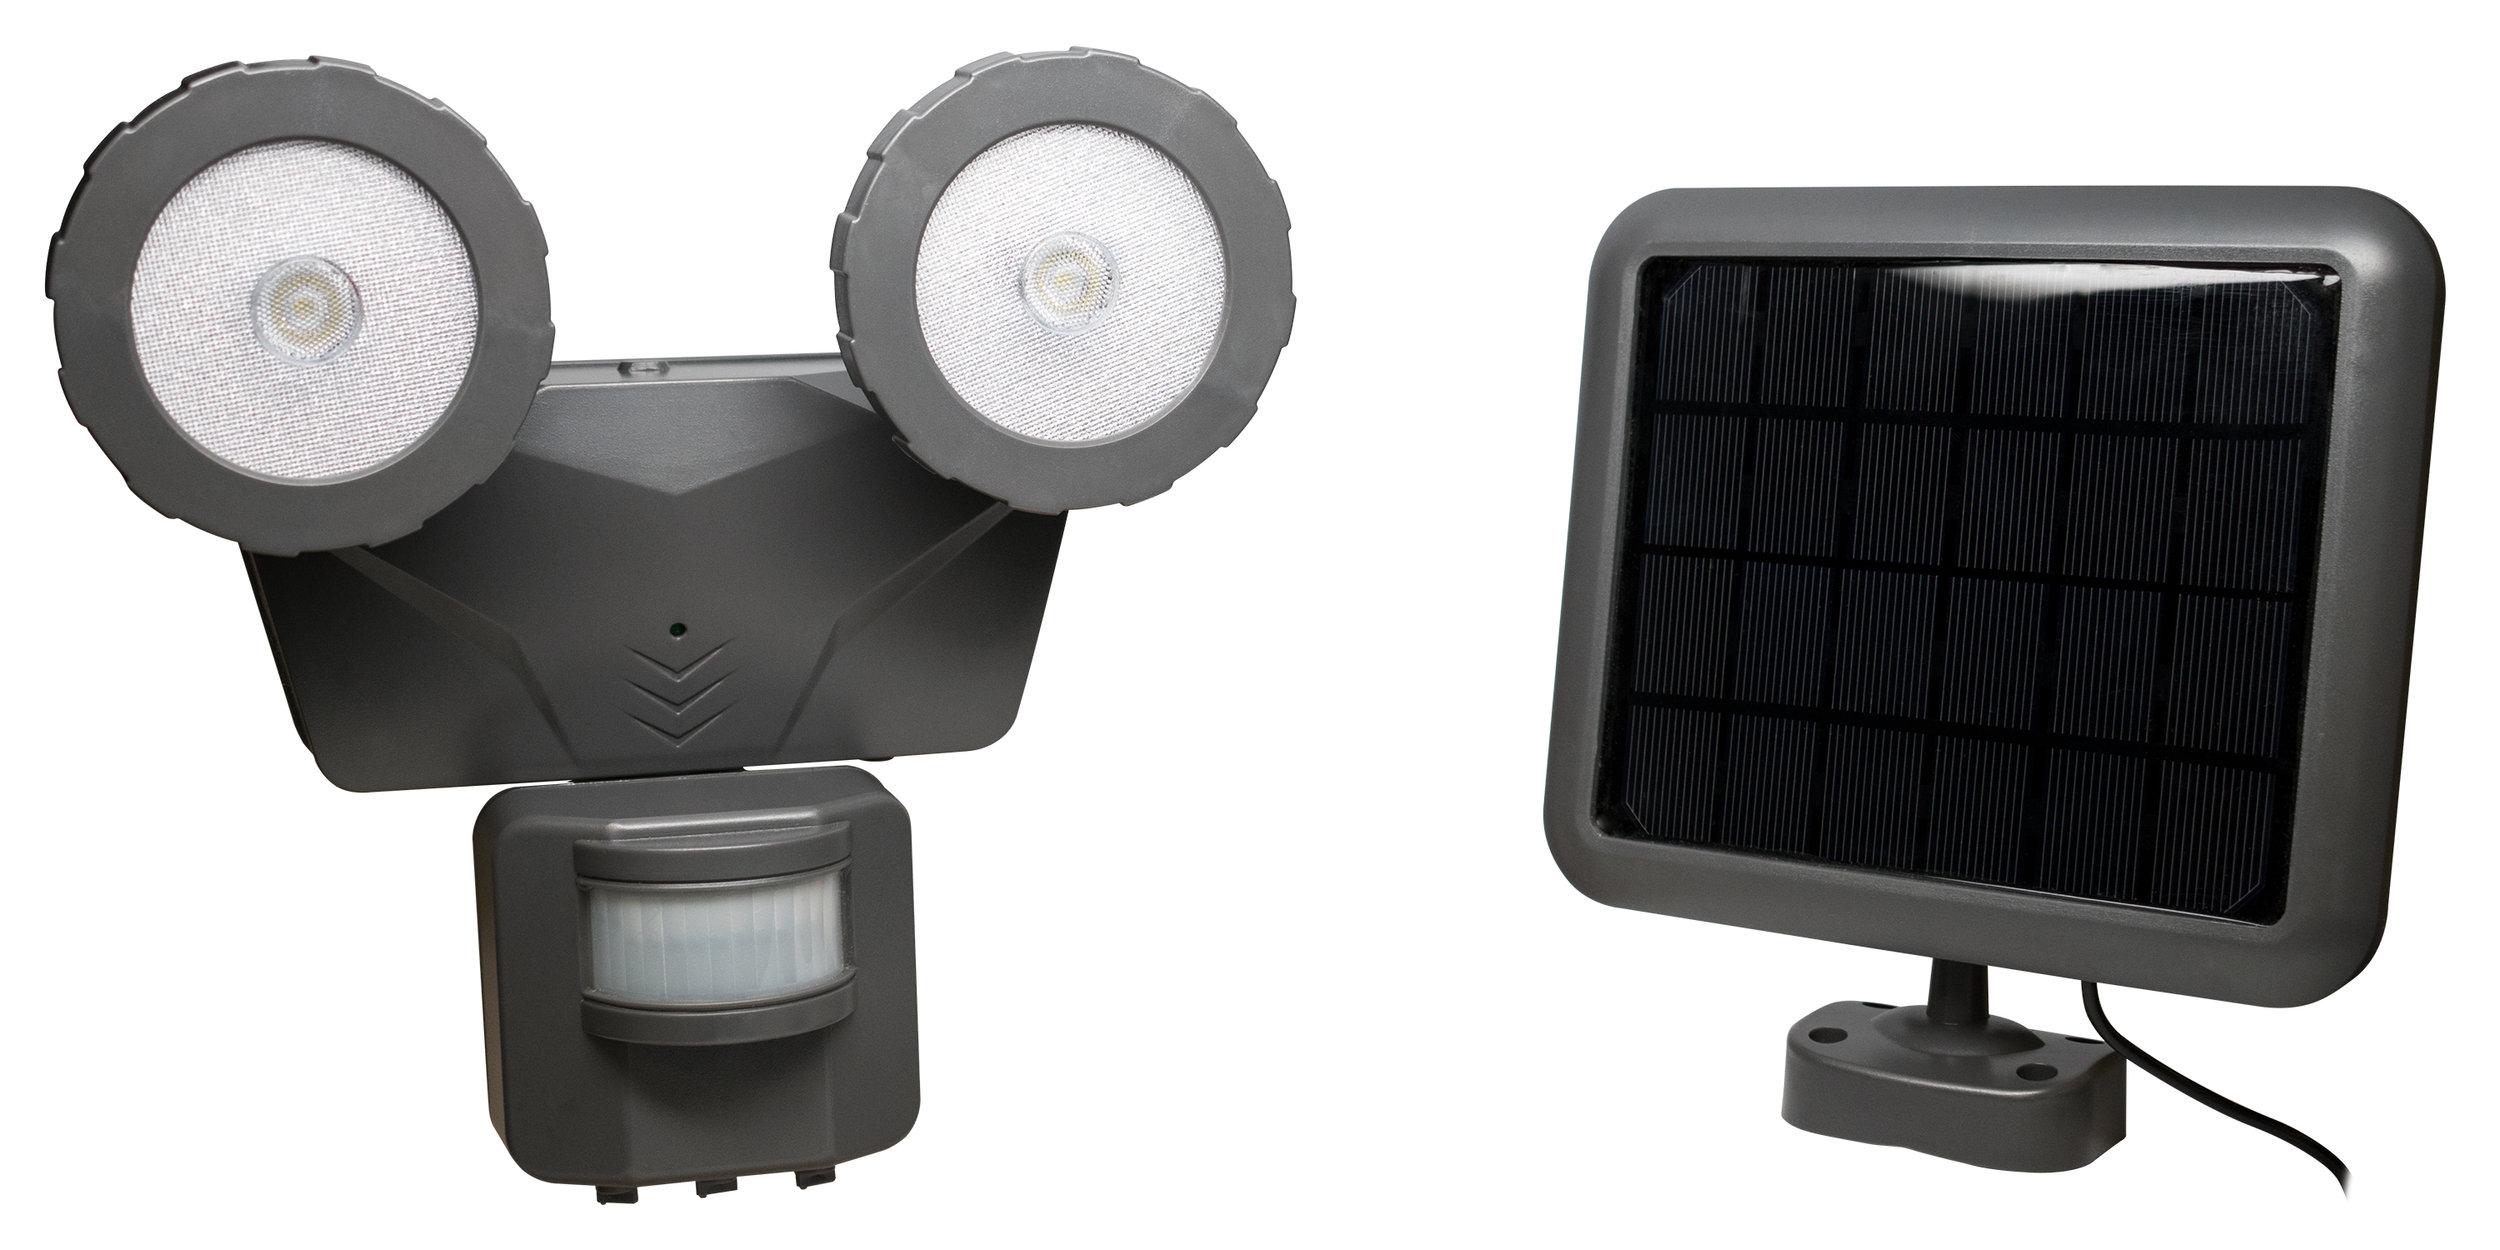 NL-DSG2 Solar Security Light with Solar Panel